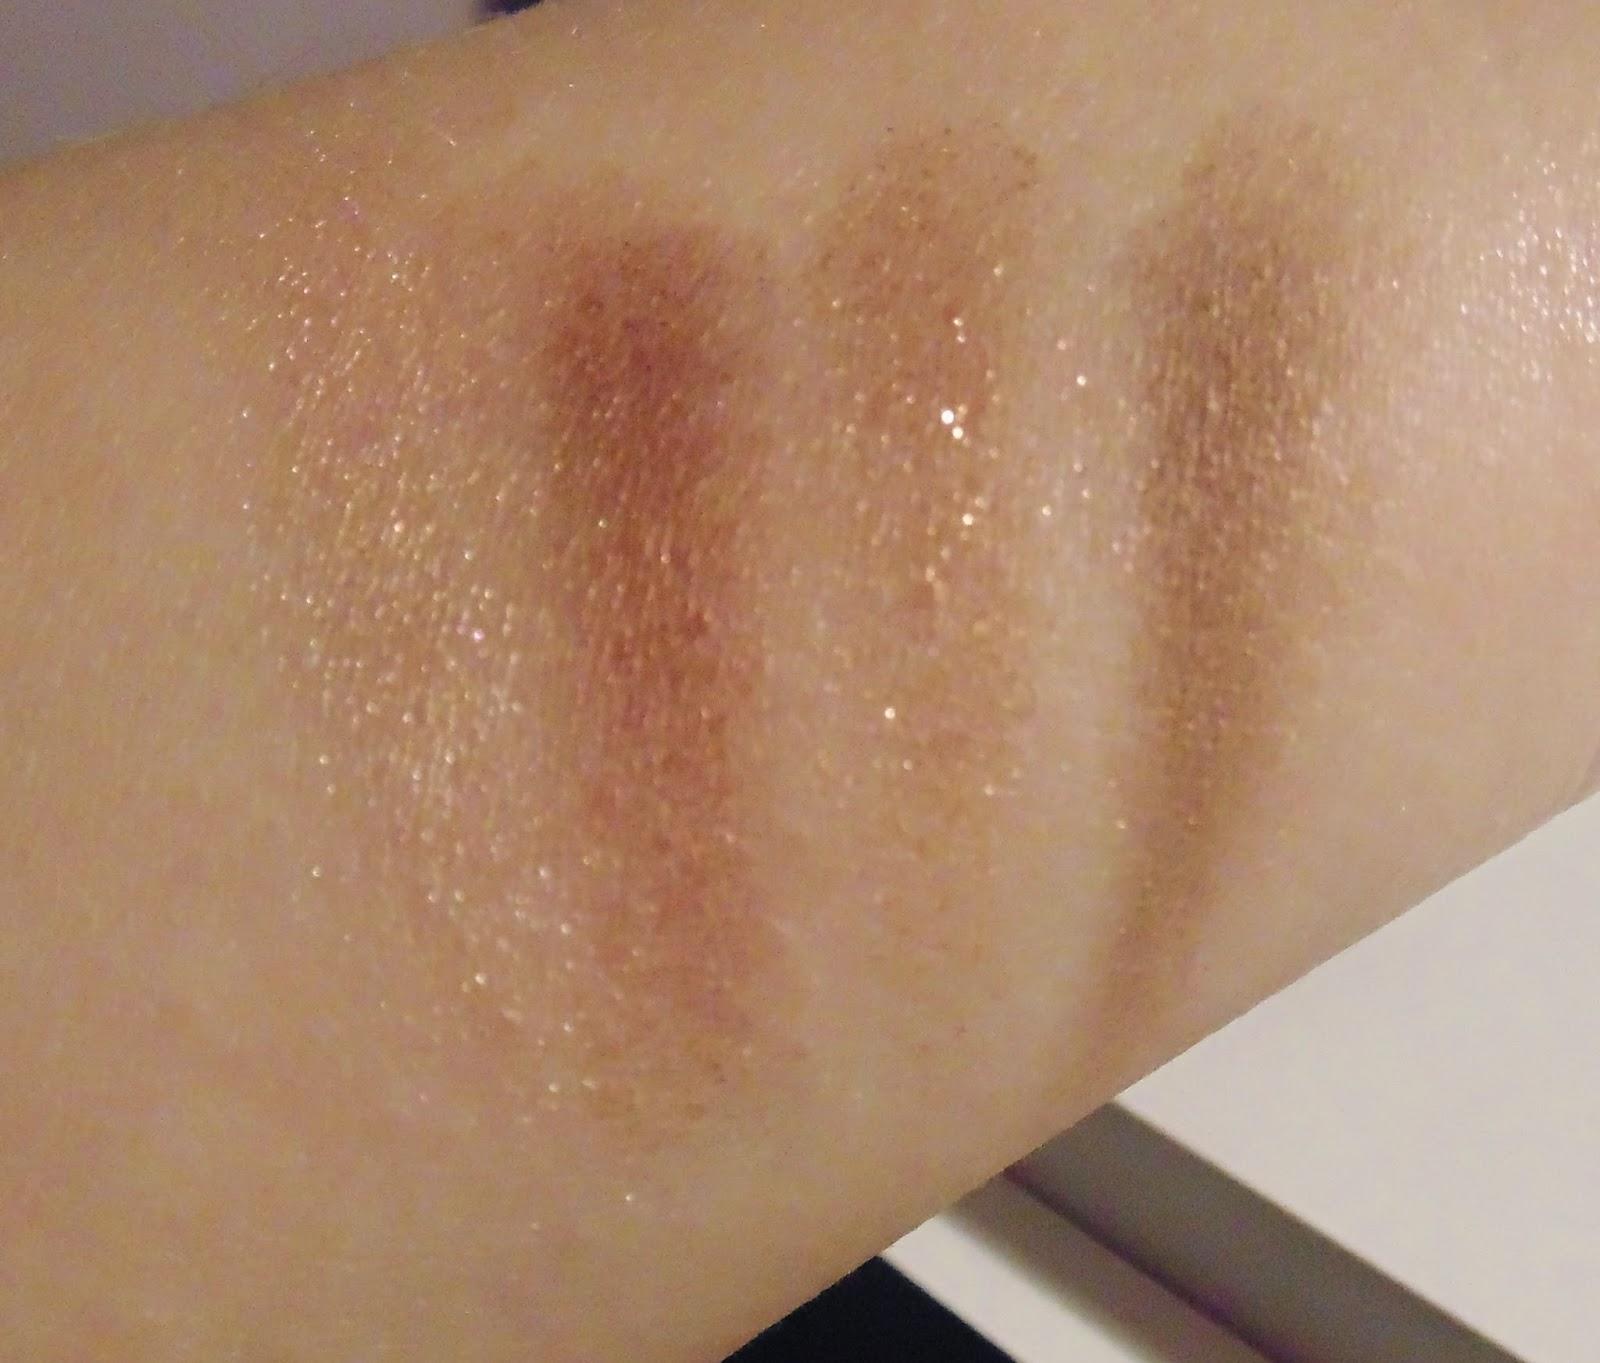 Charlotte Tilbury Dolce Vita Palette Swatches